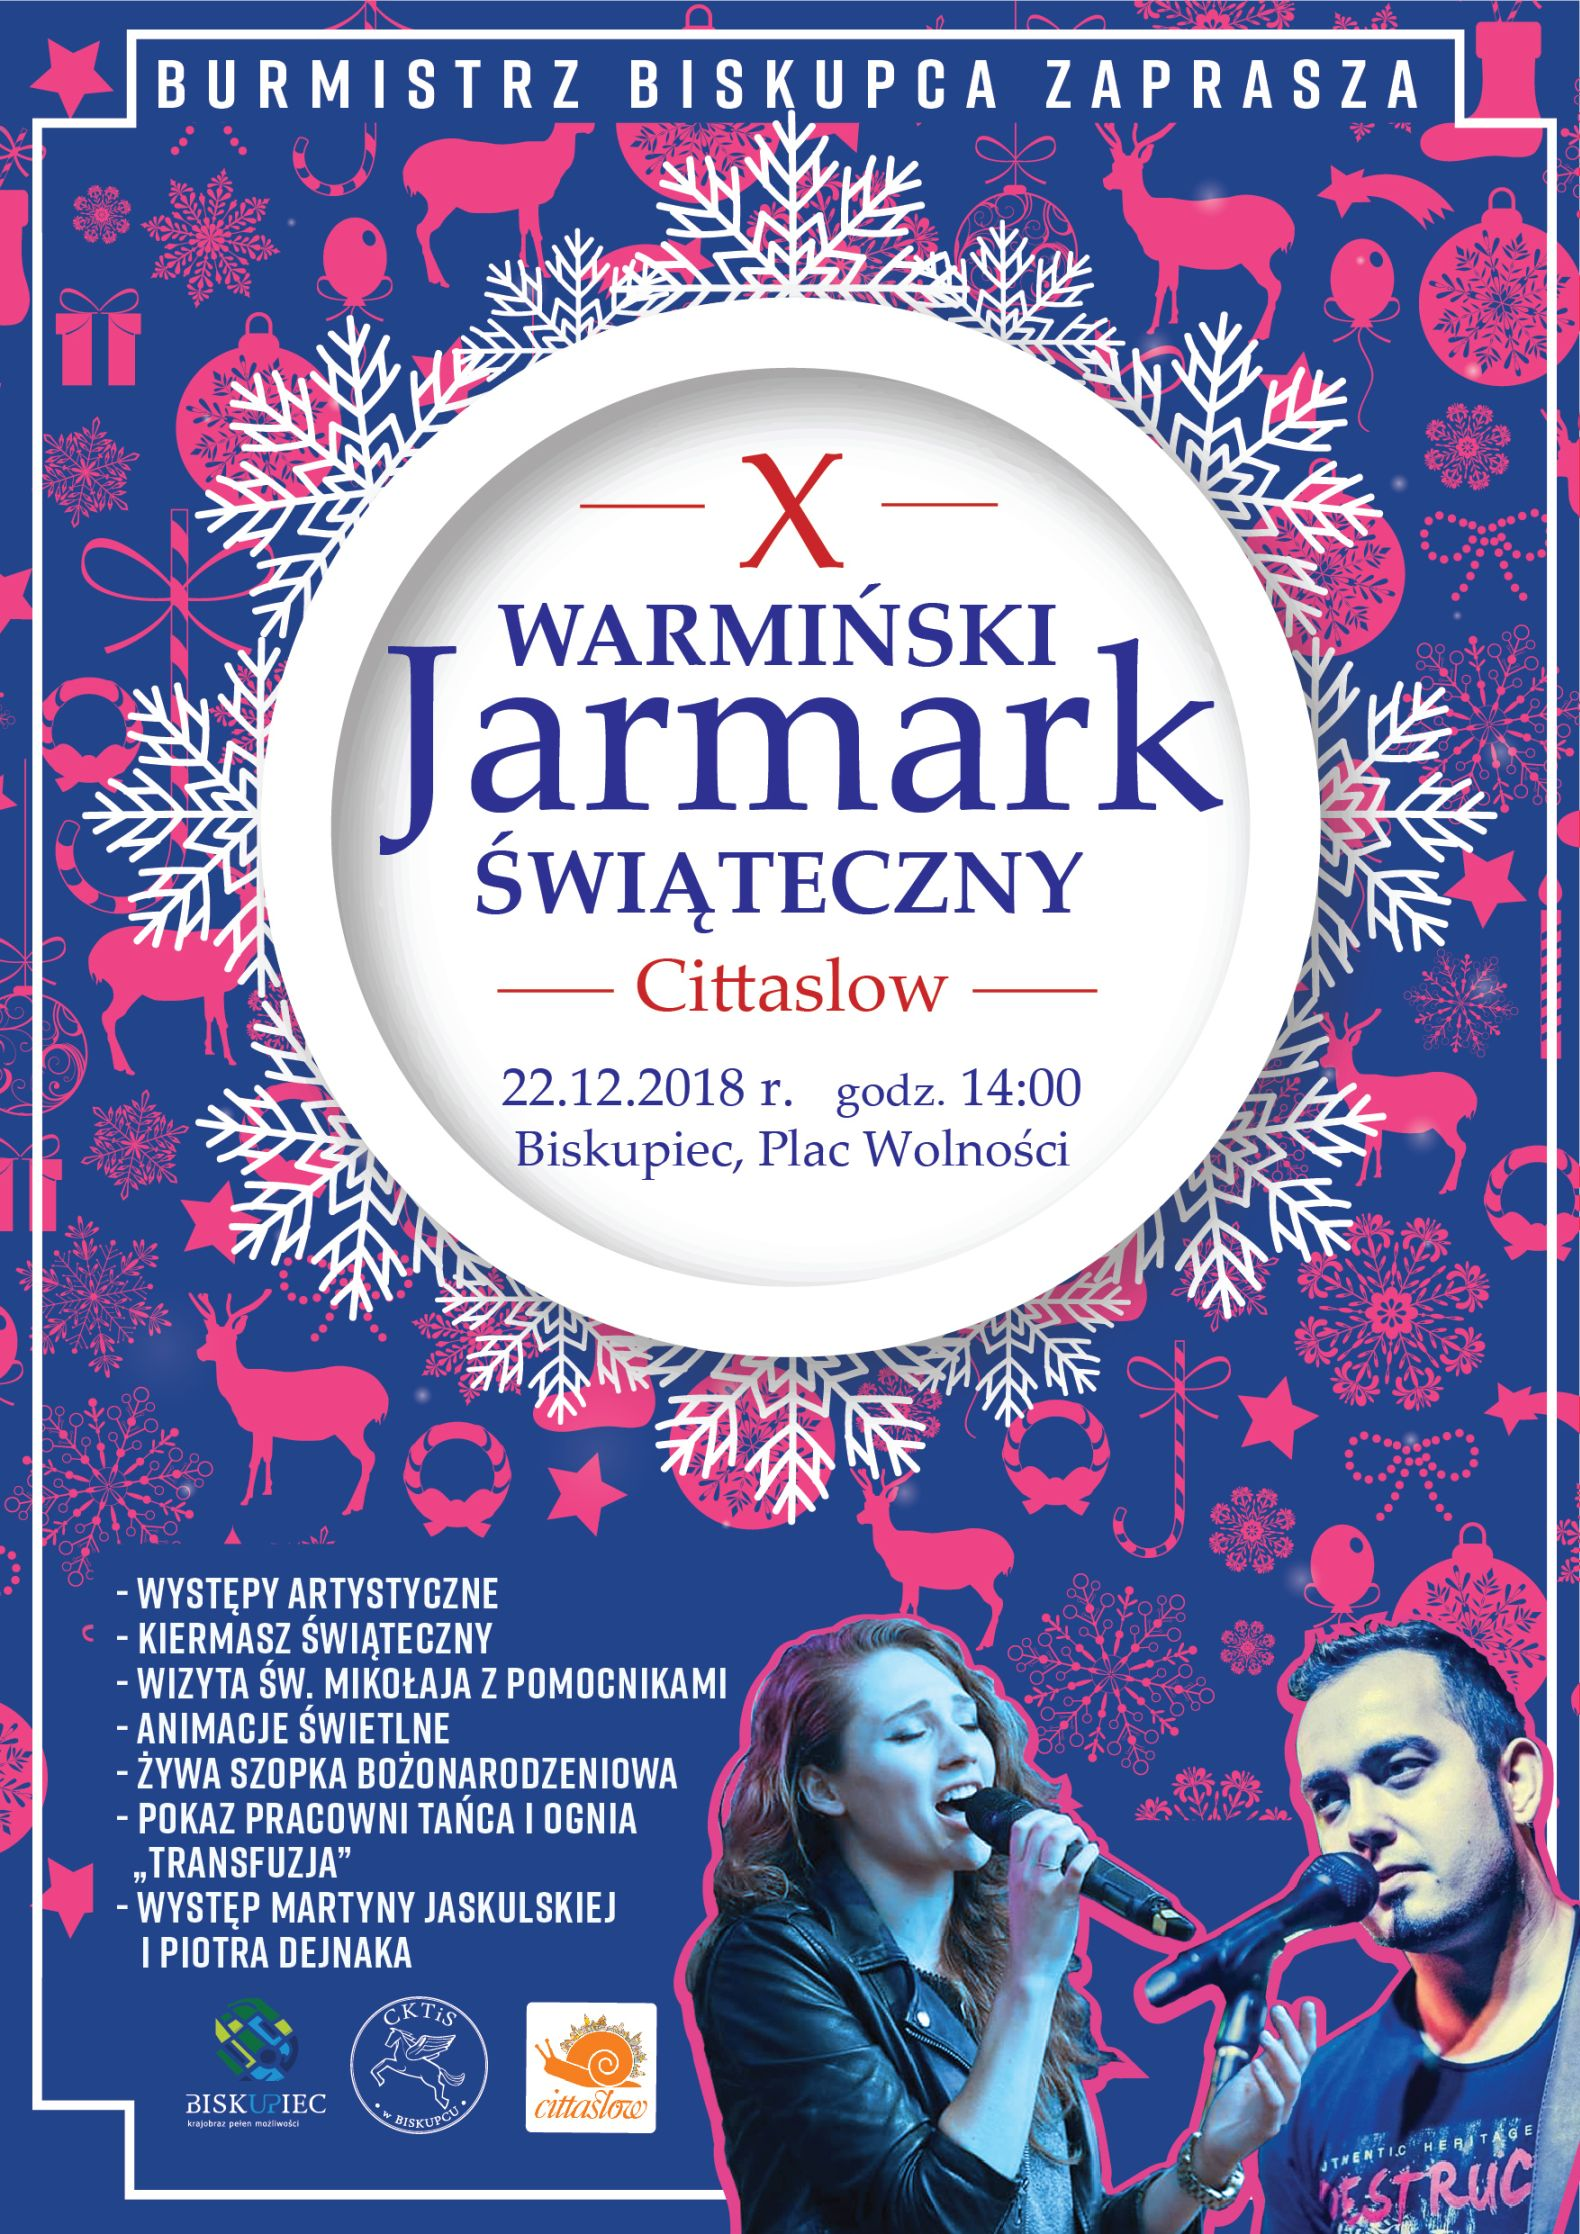 http://m.wm.pl/2018/12/orig/jarmark-plakat-513940.jpg